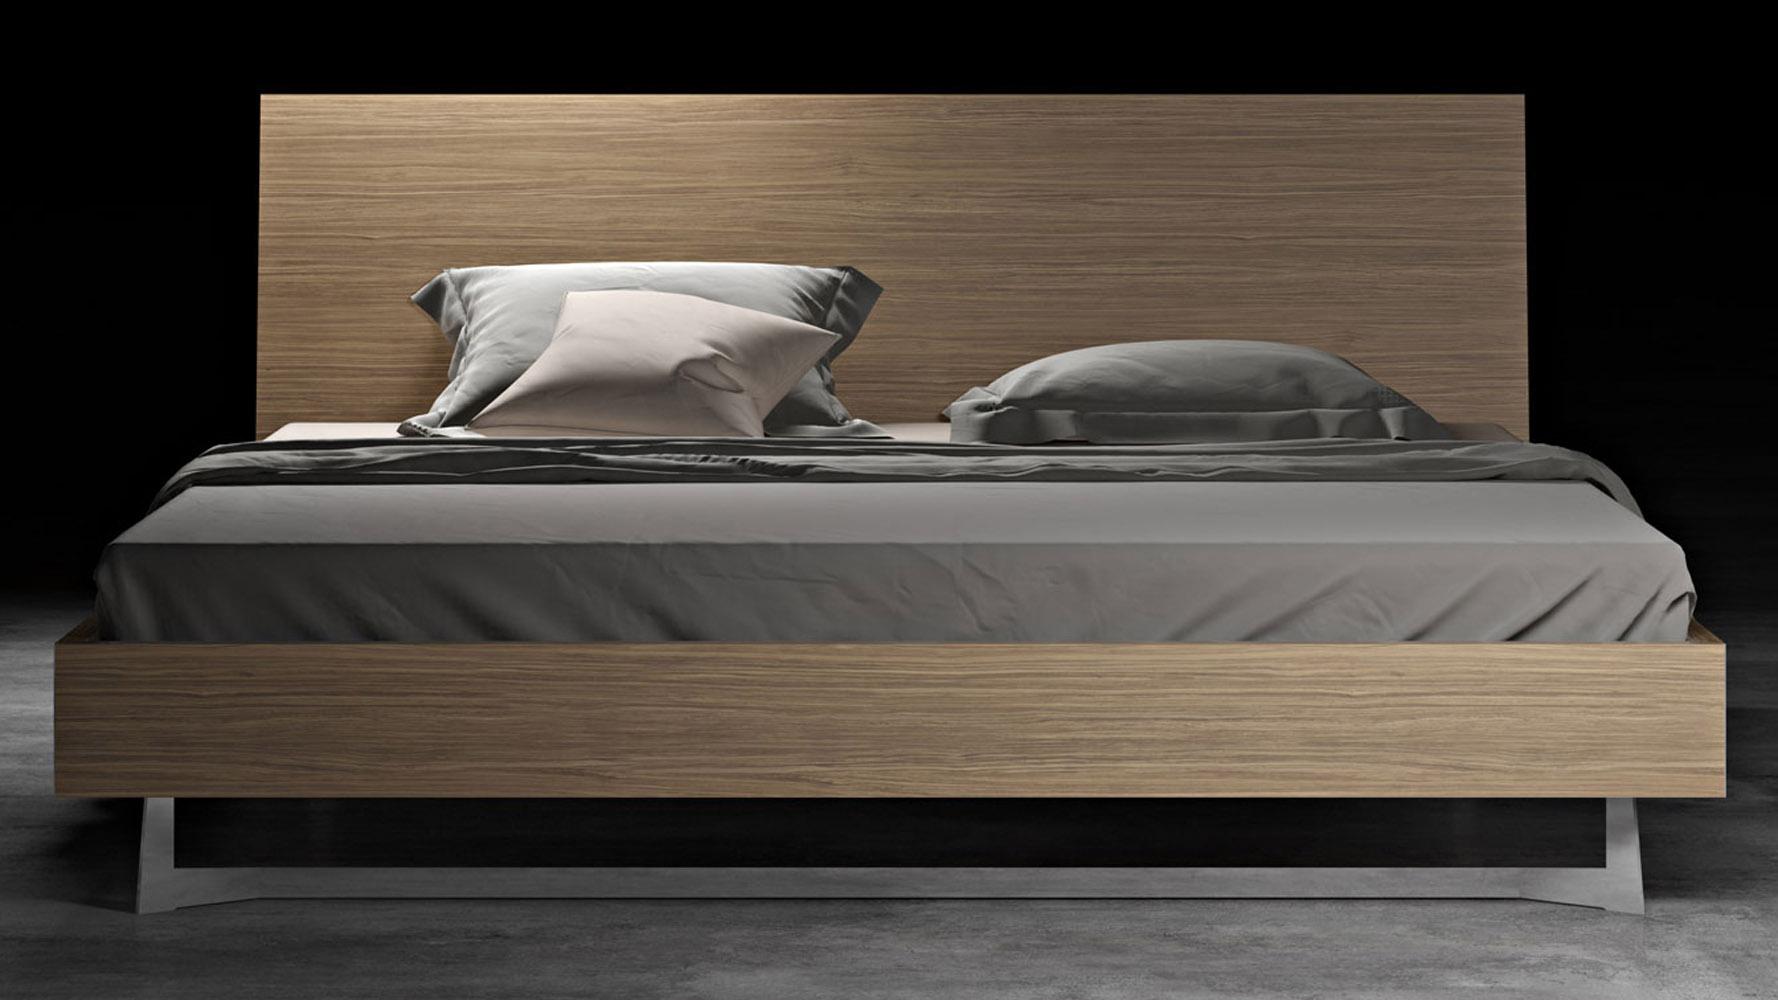 Brighton Wood and Stainless Steel Bed, Latte Walnut | Zuri Furniture